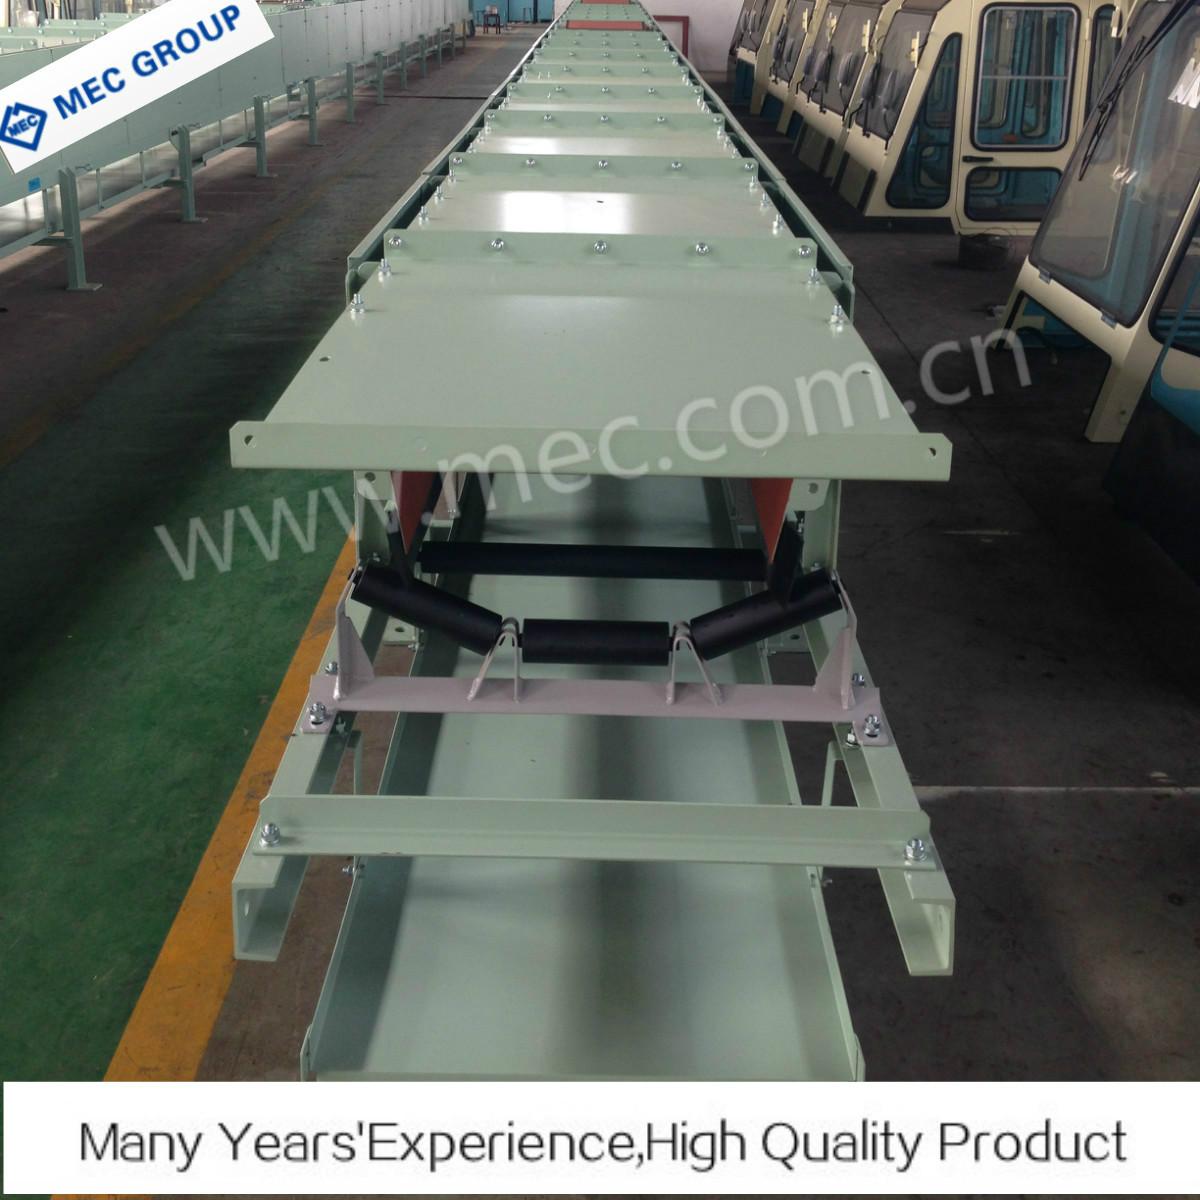 Dalian manufacturer ,Outsourcing services High quality Rubber Belt Conveyer/Apron Conveyer